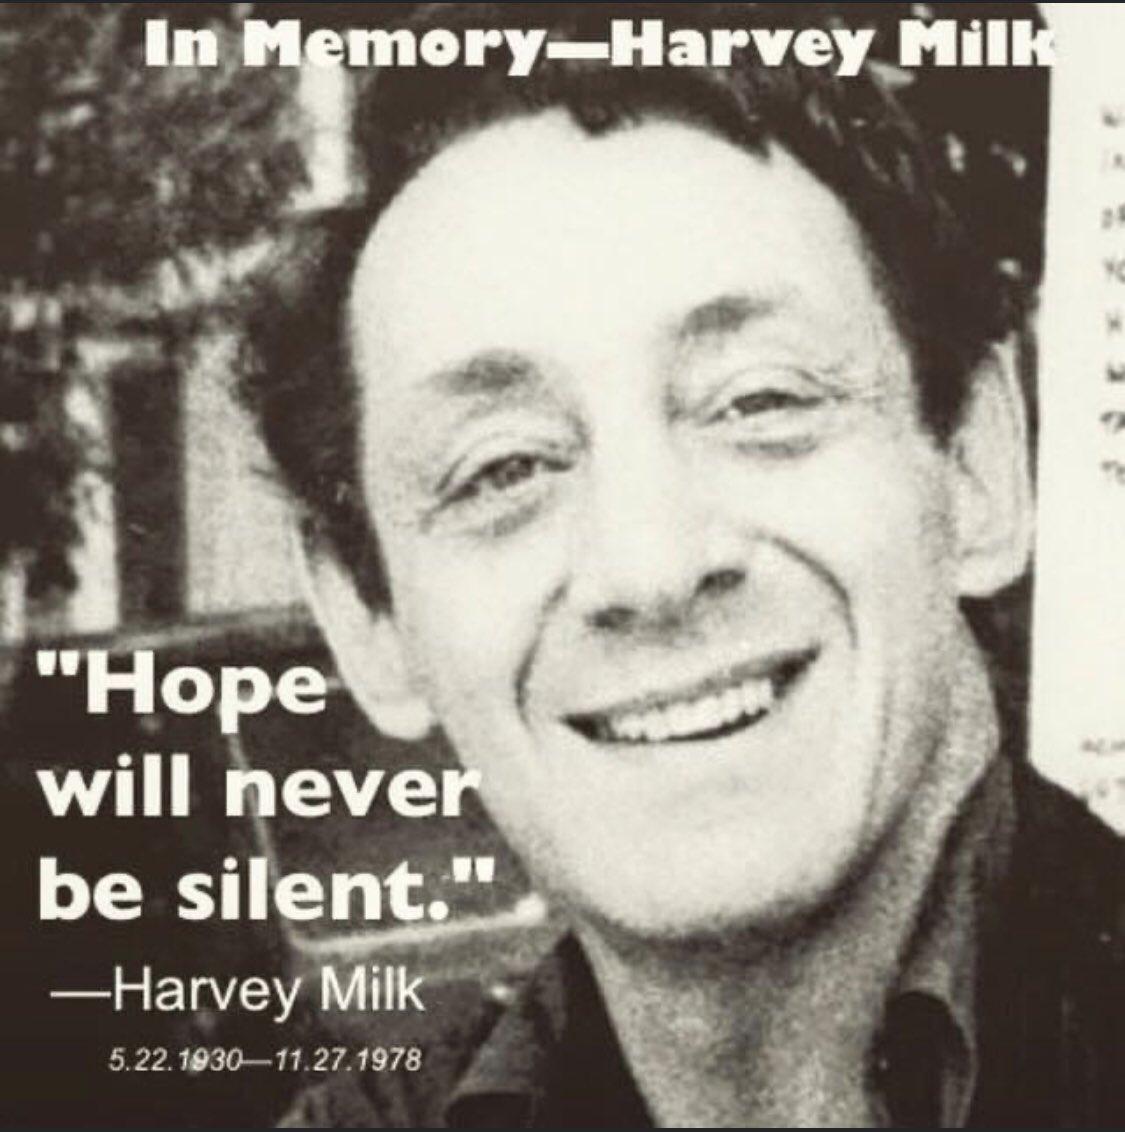 Happy Birthday Harvey Milk!